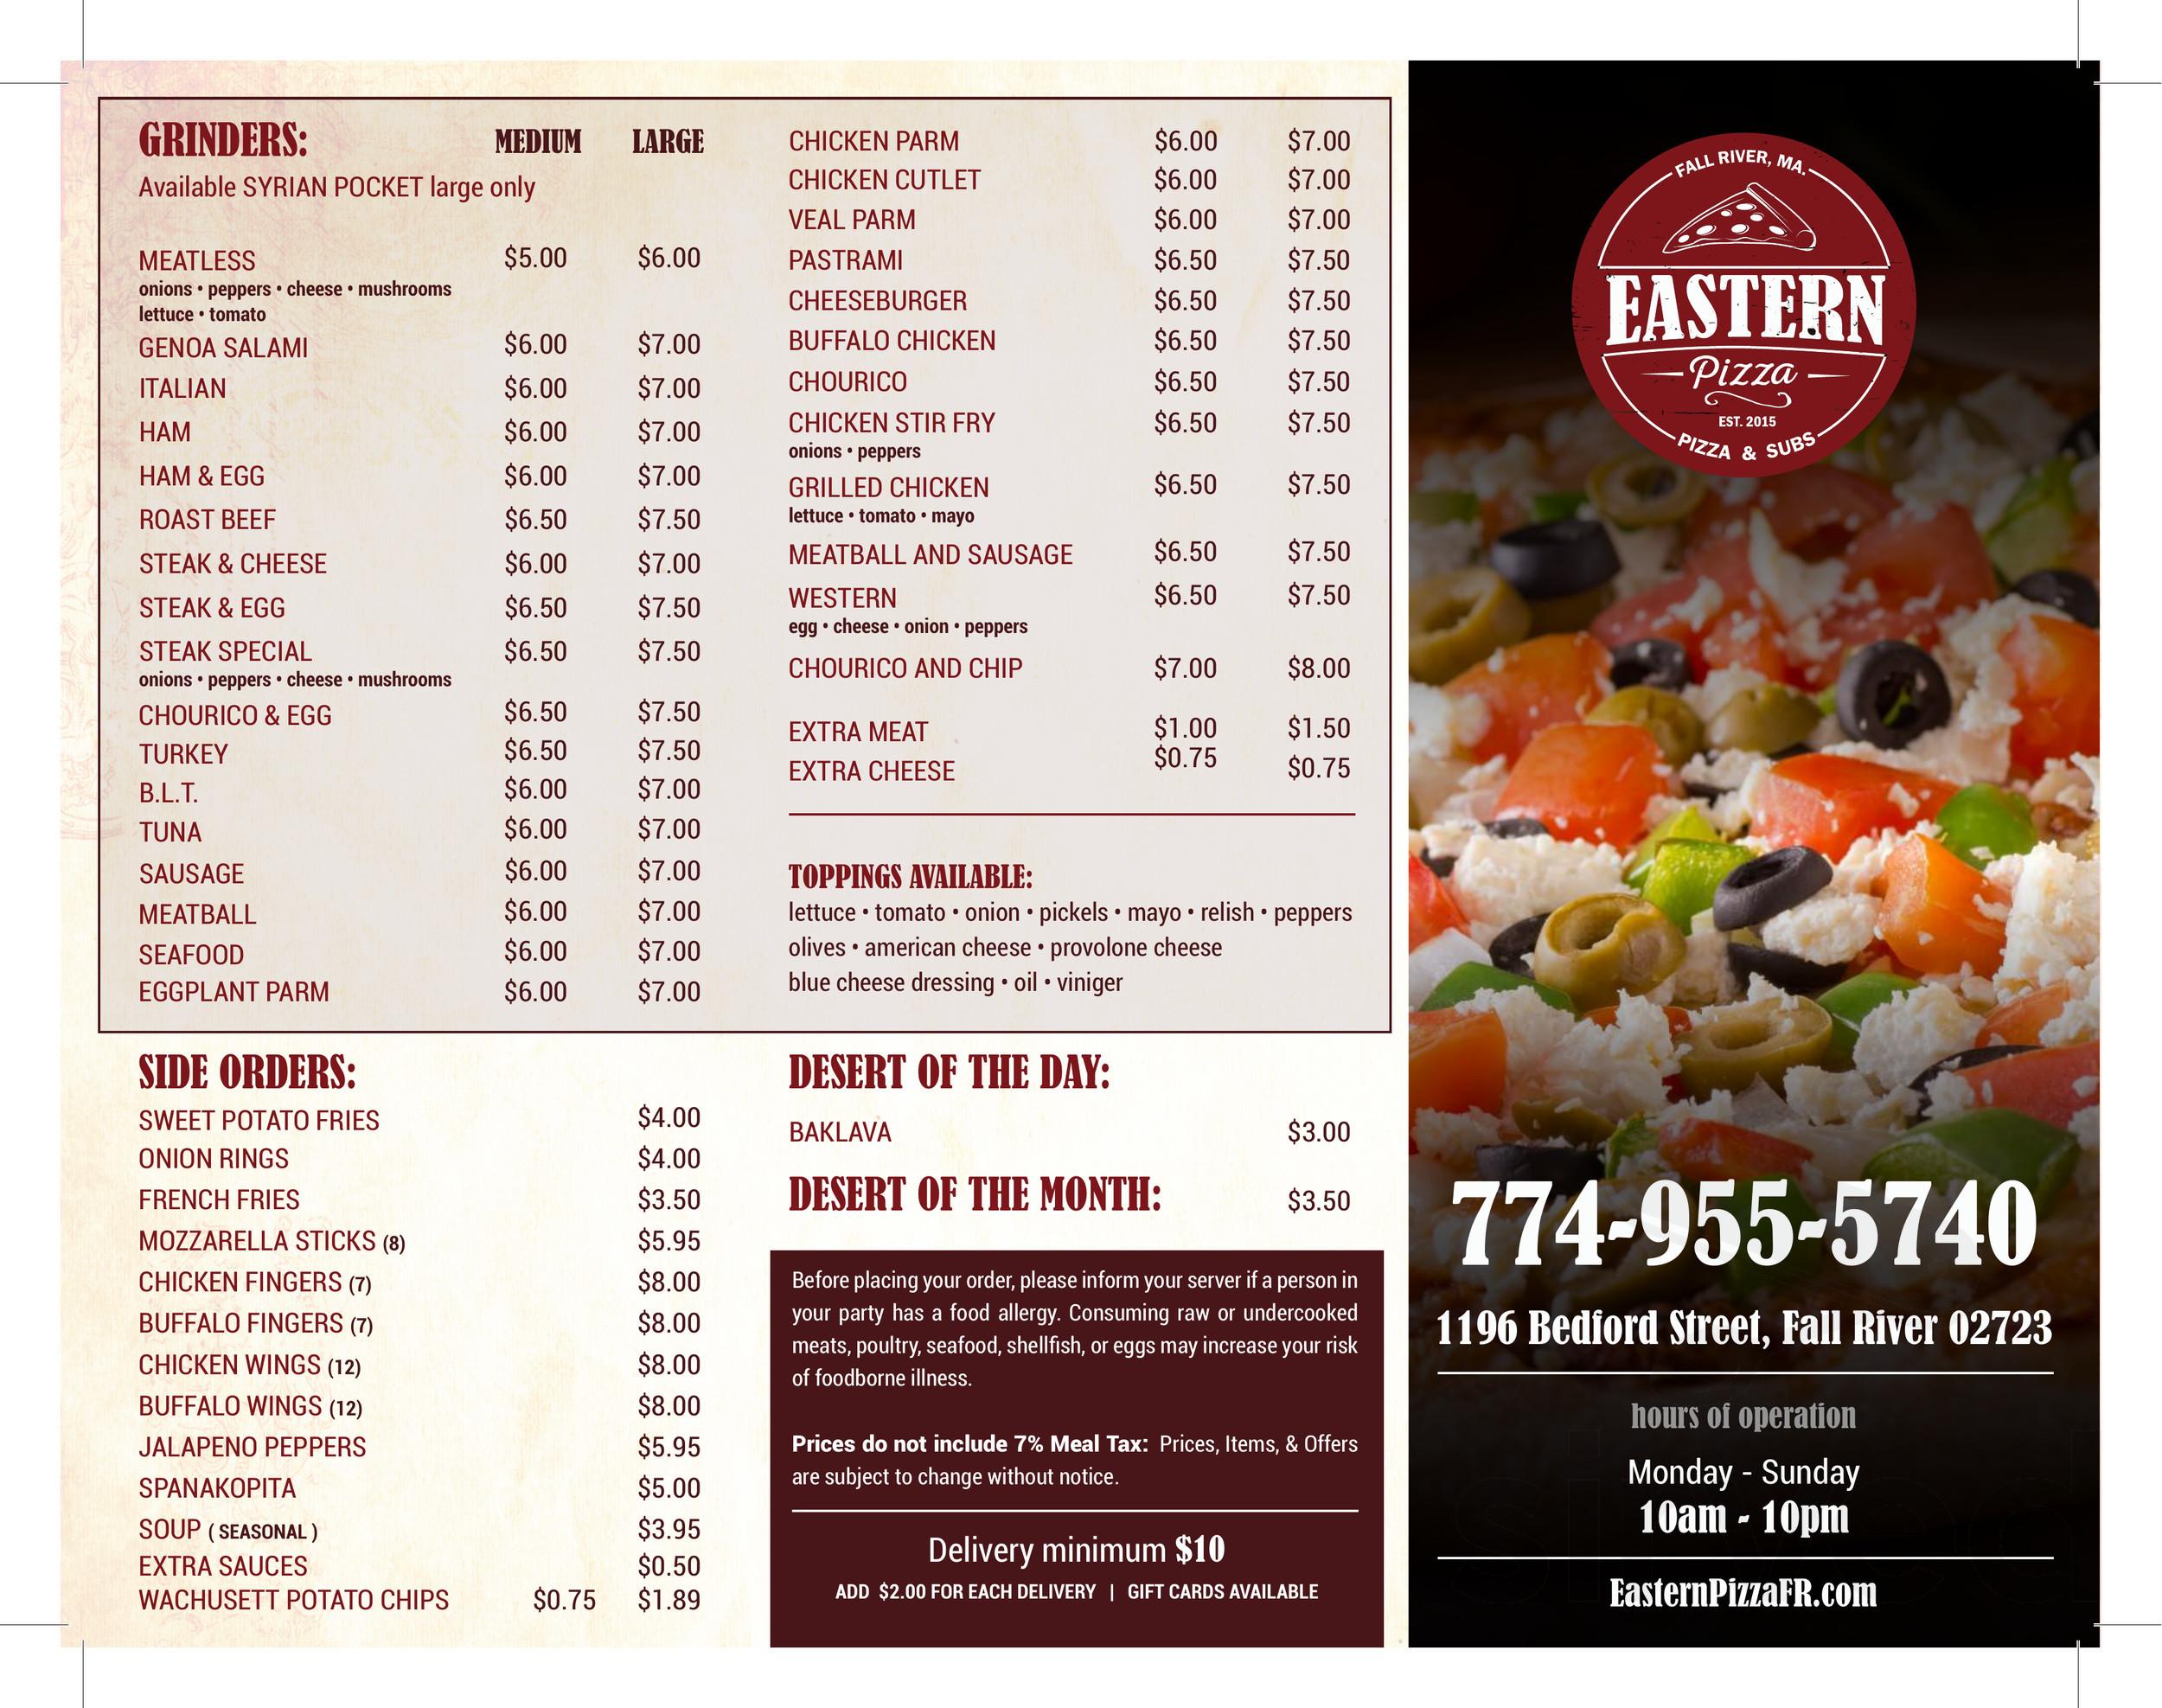 Eastern Pizza menu in Fall River, Massachusetts, USA